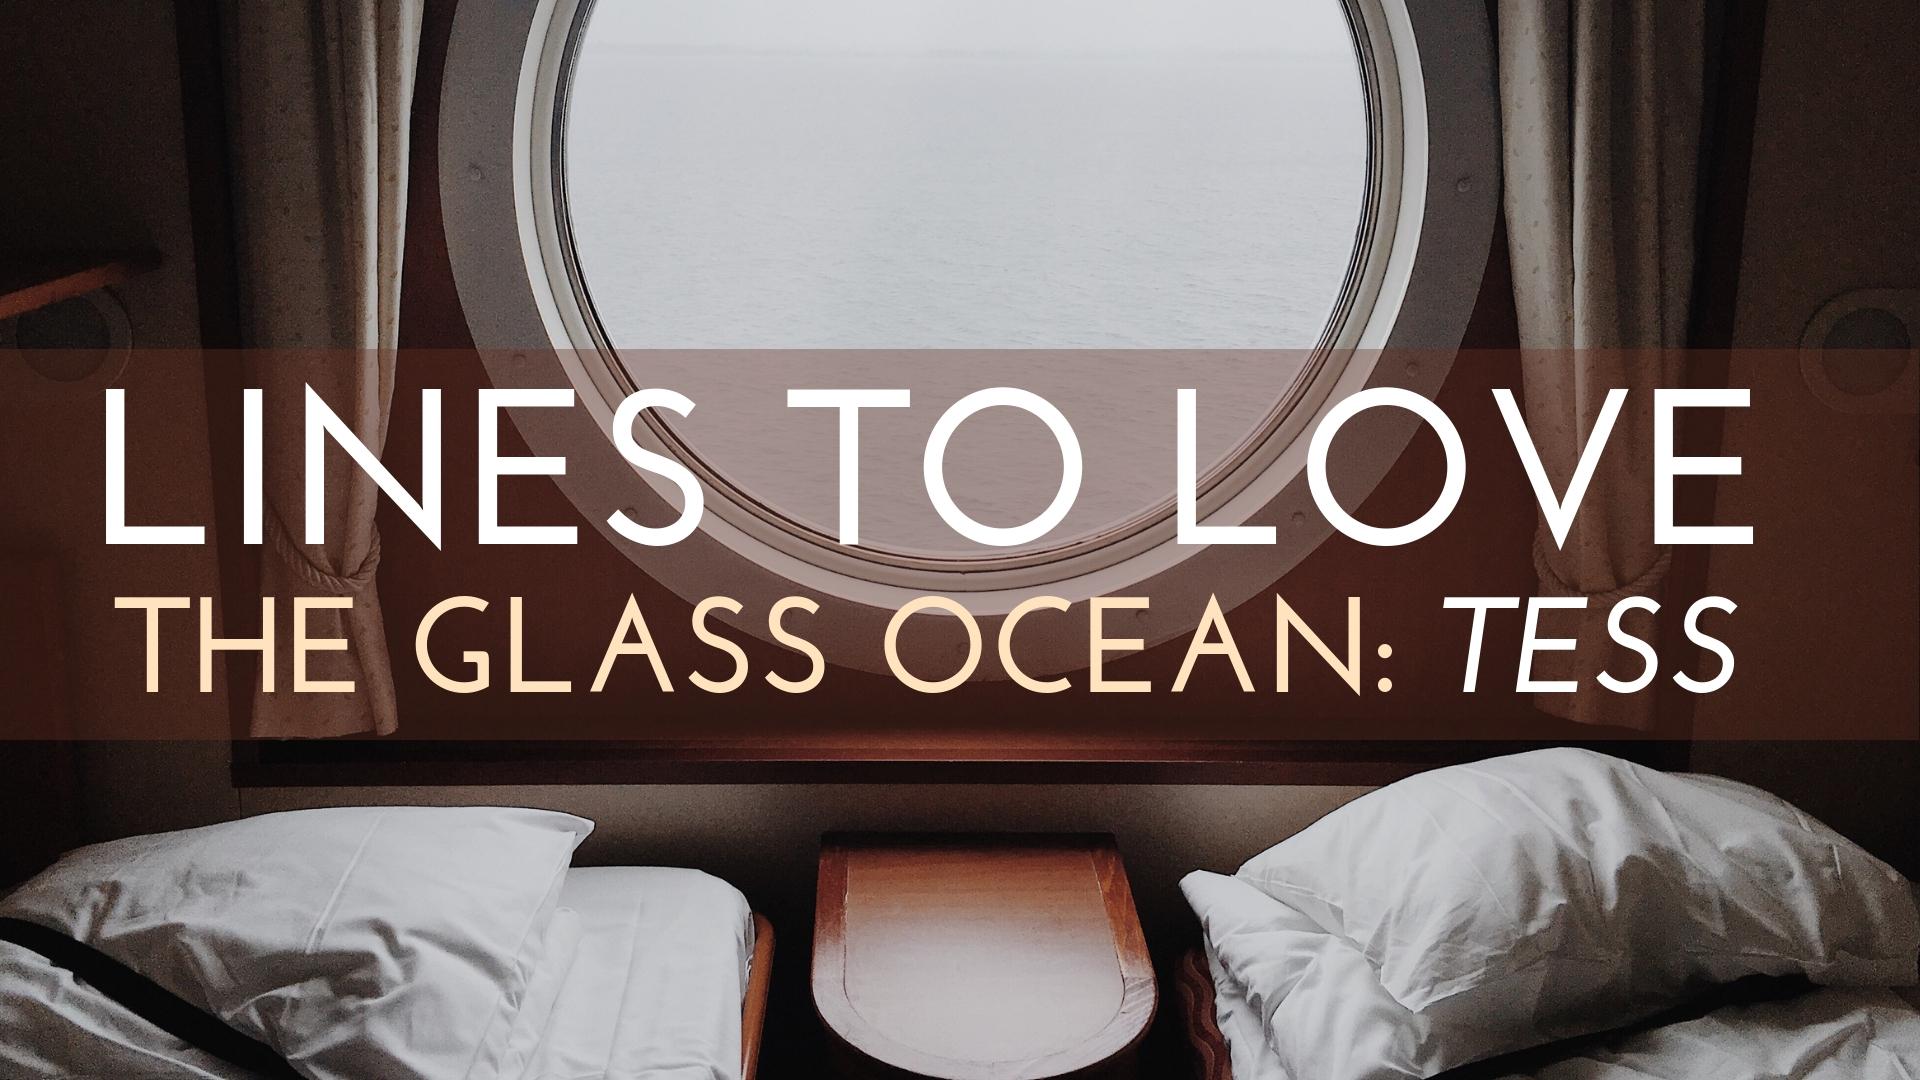 banner-lines-to-love-tgo-tess-01.jpg